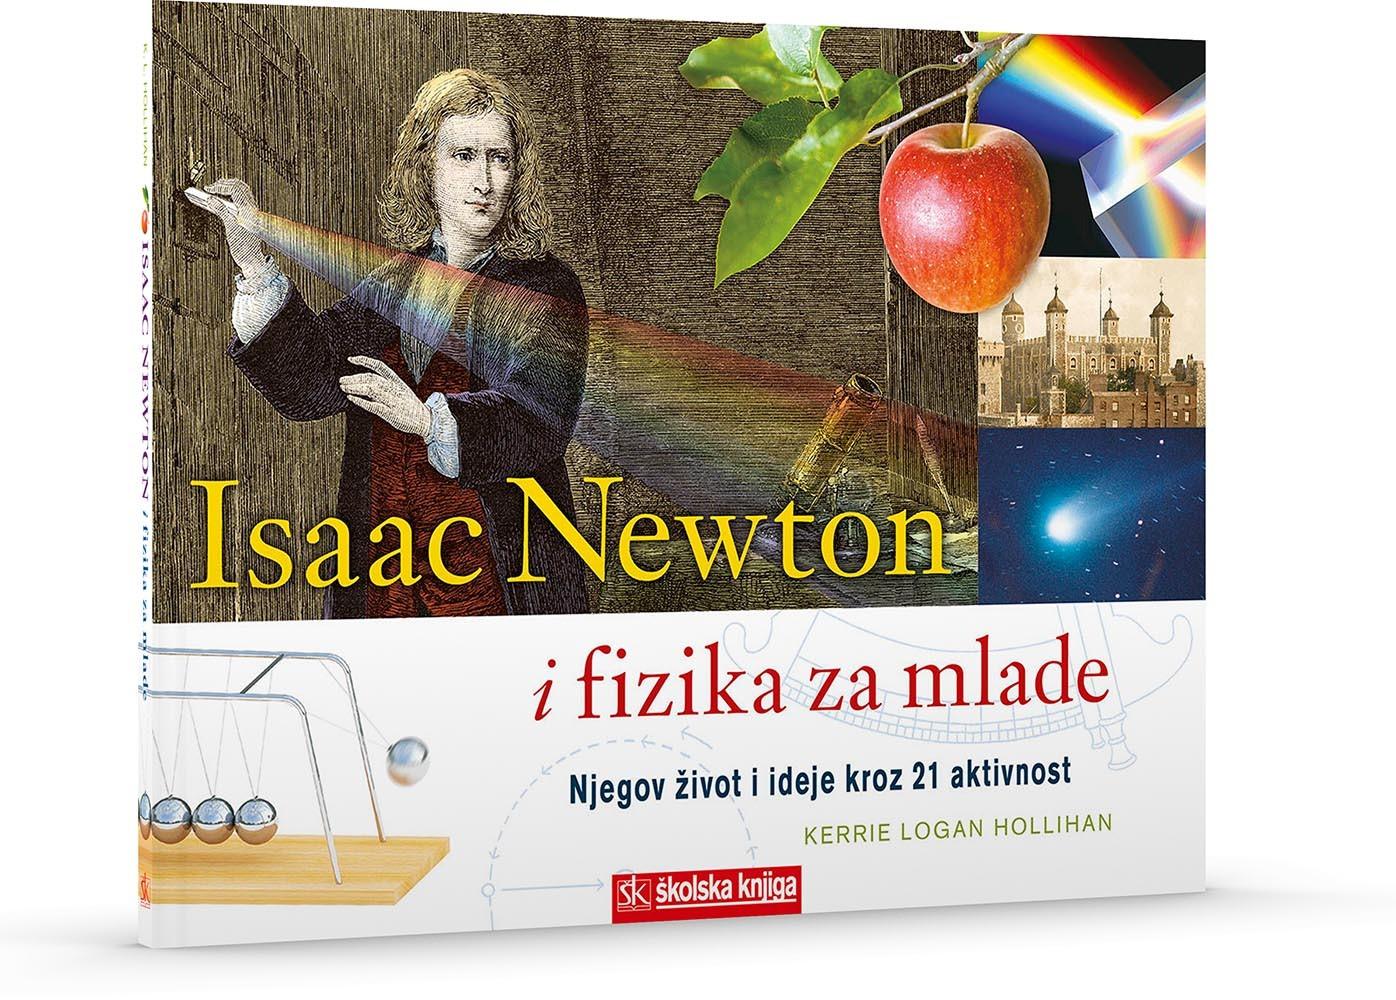 Isaac Newton i fizika za mlade - Njegov život i ideje kroz 21 aktivnost